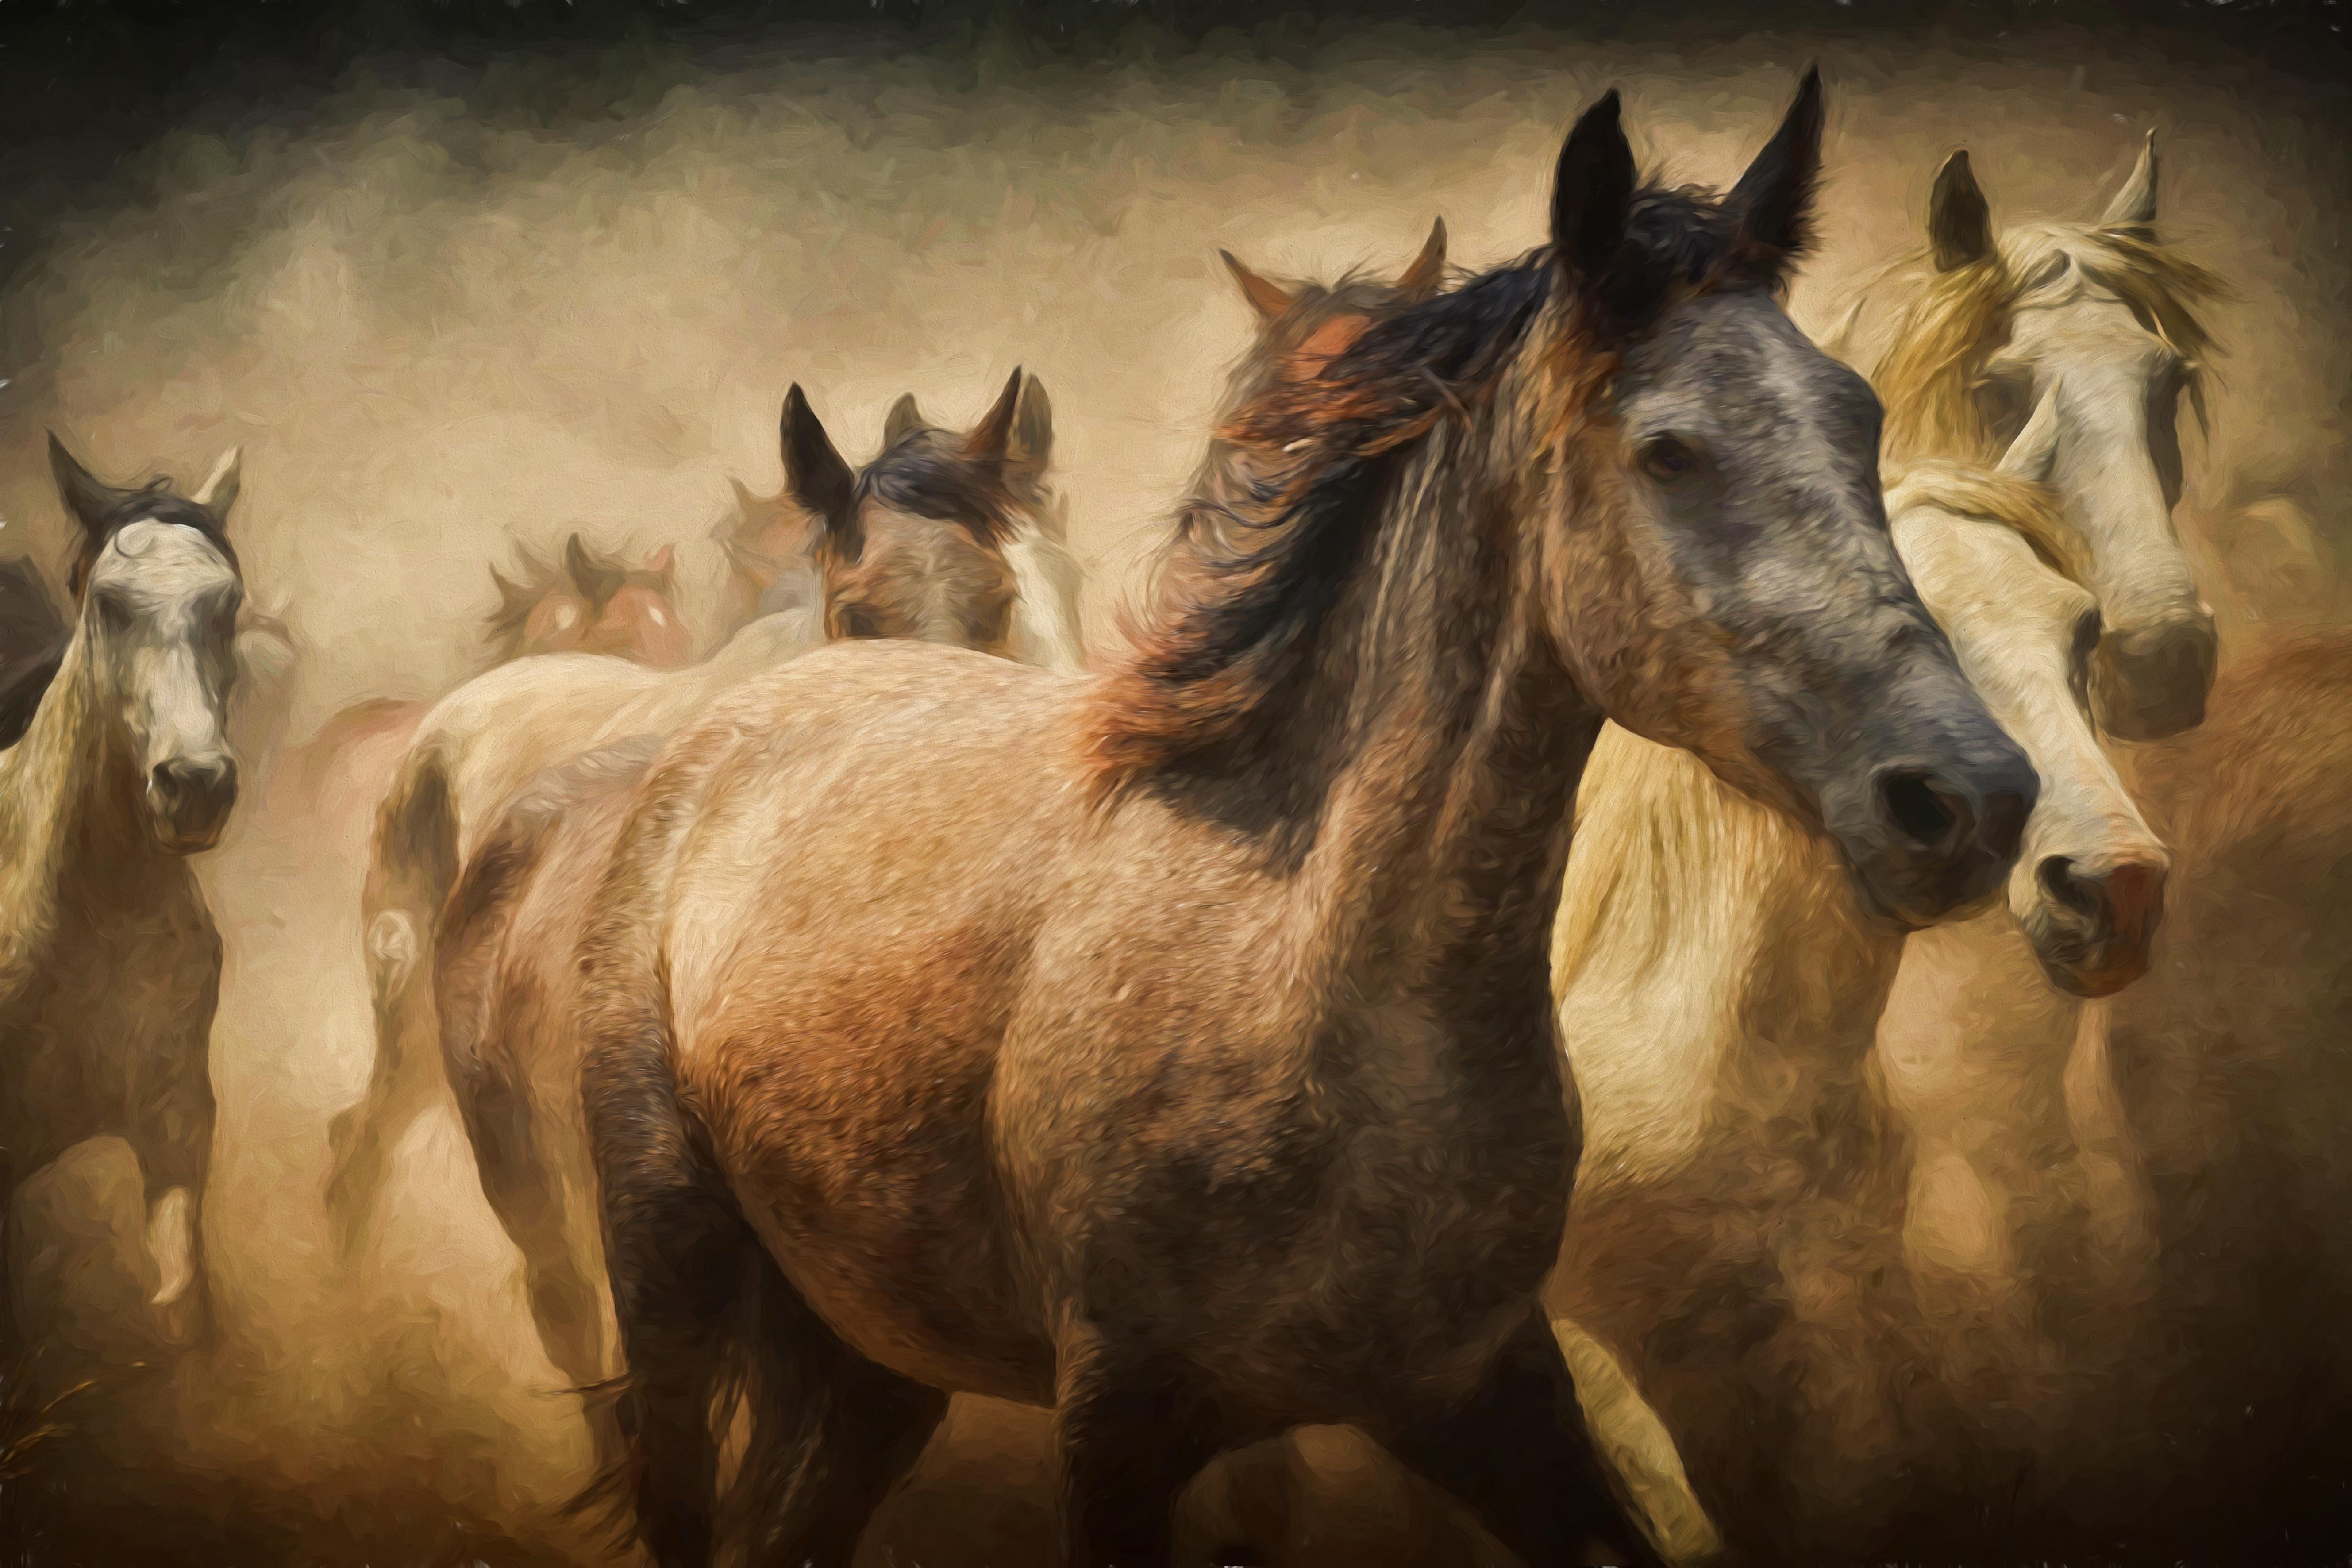 free images creative stallion mane still life artwork horses vertebrate mare digital. Black Bedroom Furniture Sets. Home Design Ideas